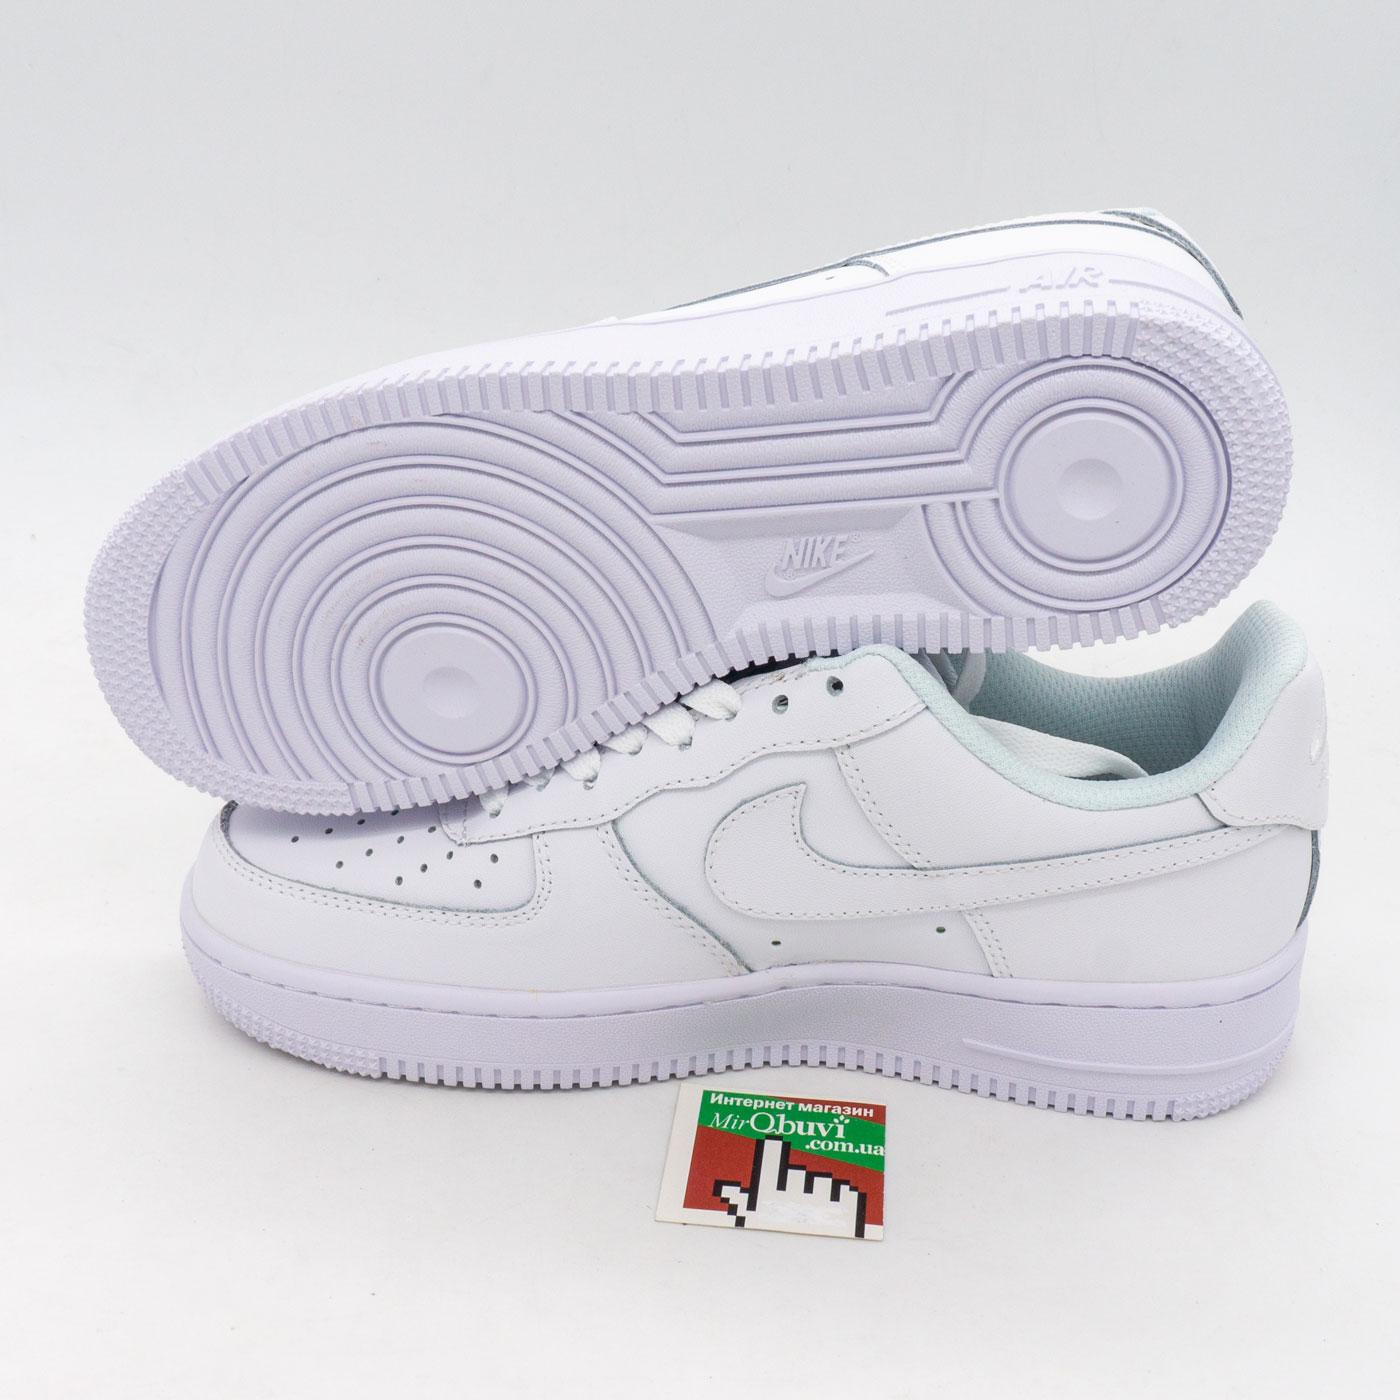 фото front Кроссовки Nike Air Force 1 низкие белые - Топ качество front